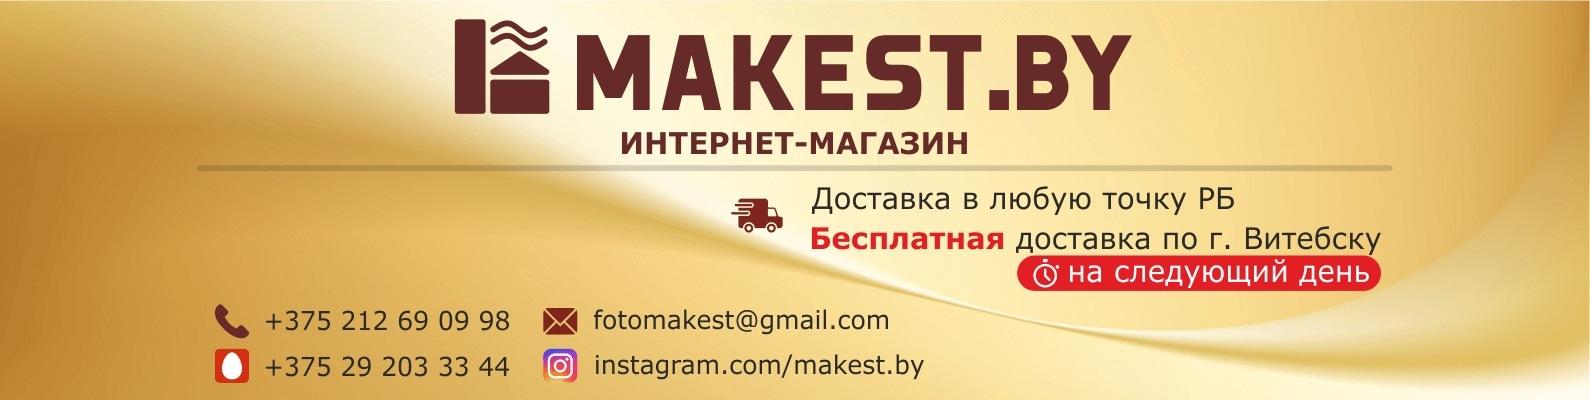 Максимал Бай Интернет Магазин